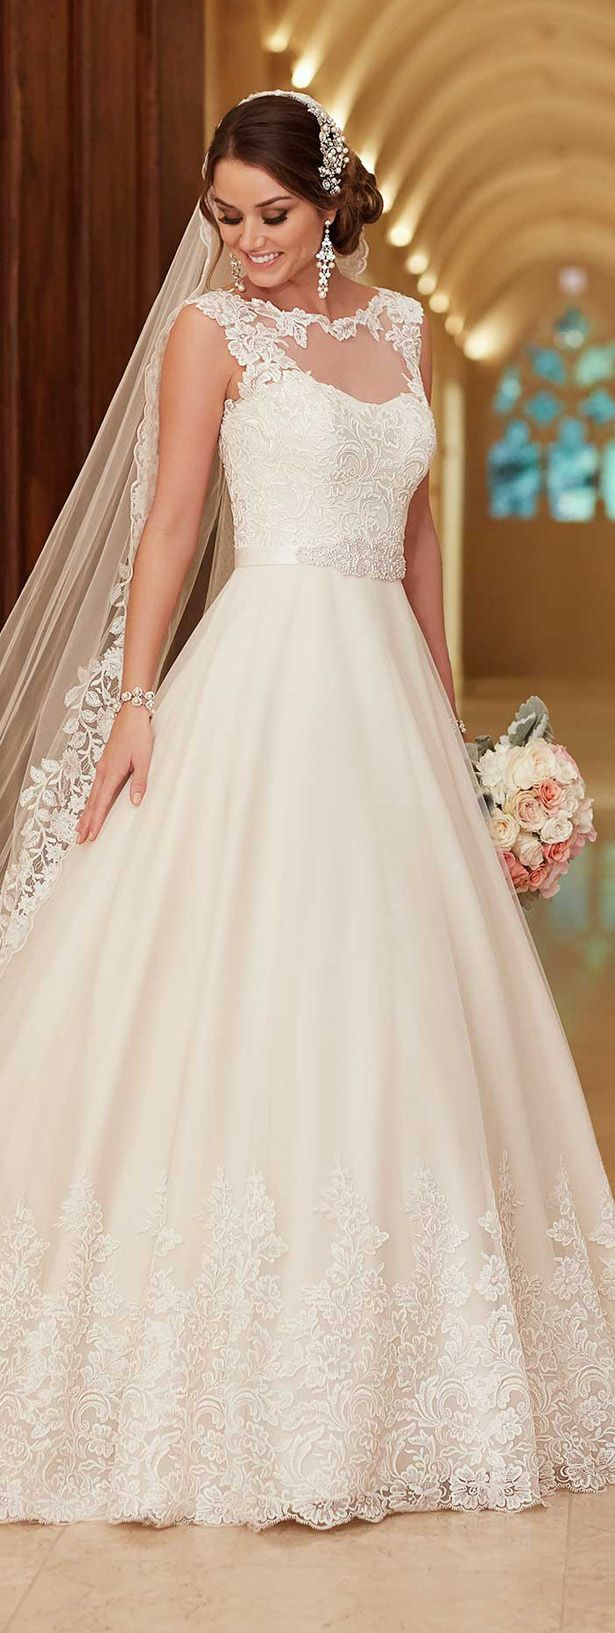 Ronald joyce lace wedding dress september 2018 BoBu Ana burteaanamaria on Pinterest